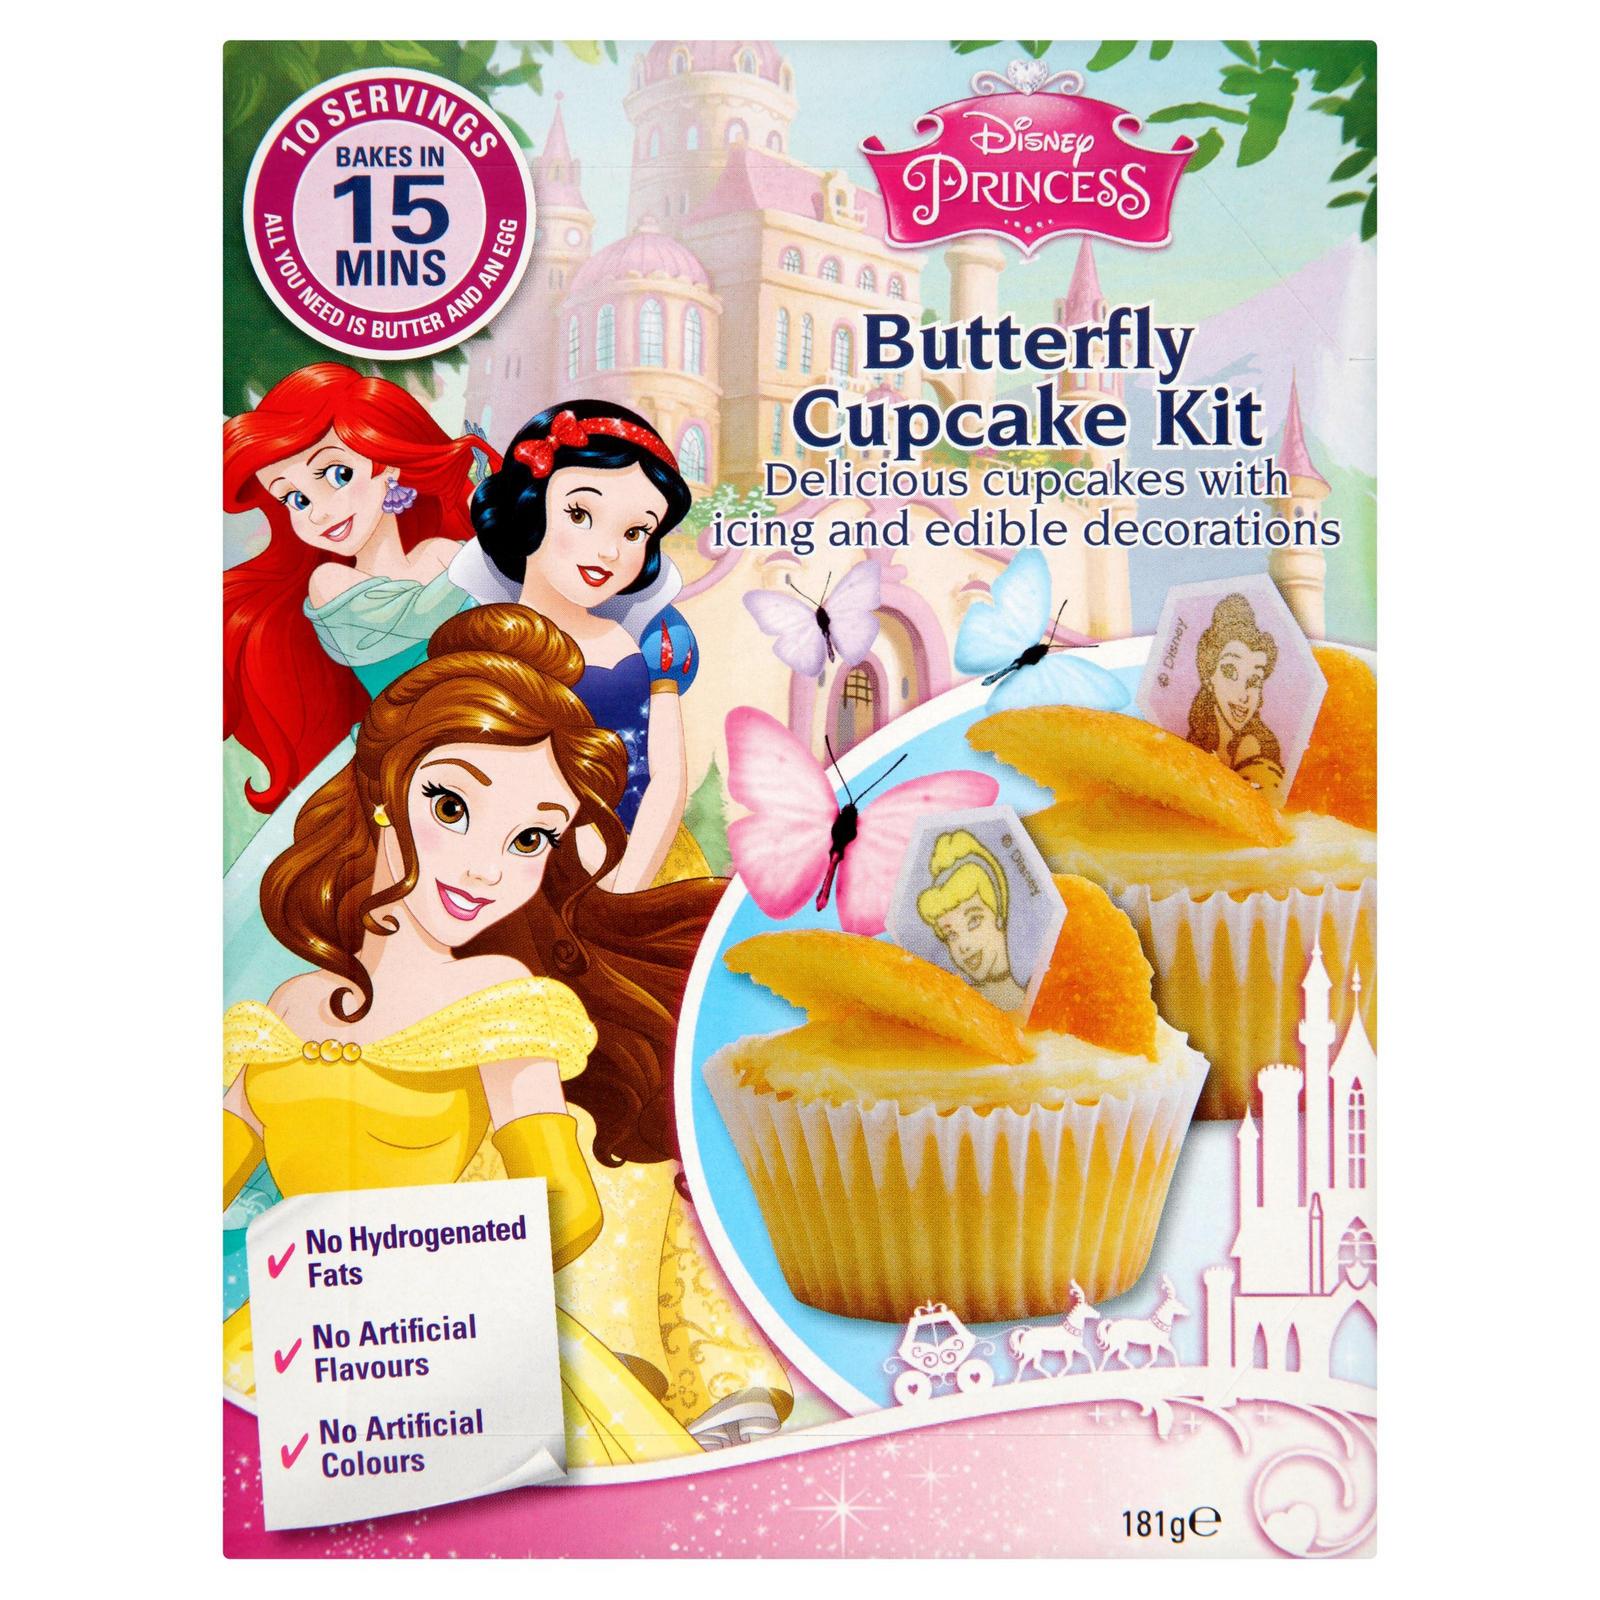 Disney Princess Butterfly Cupcake Kit 181g